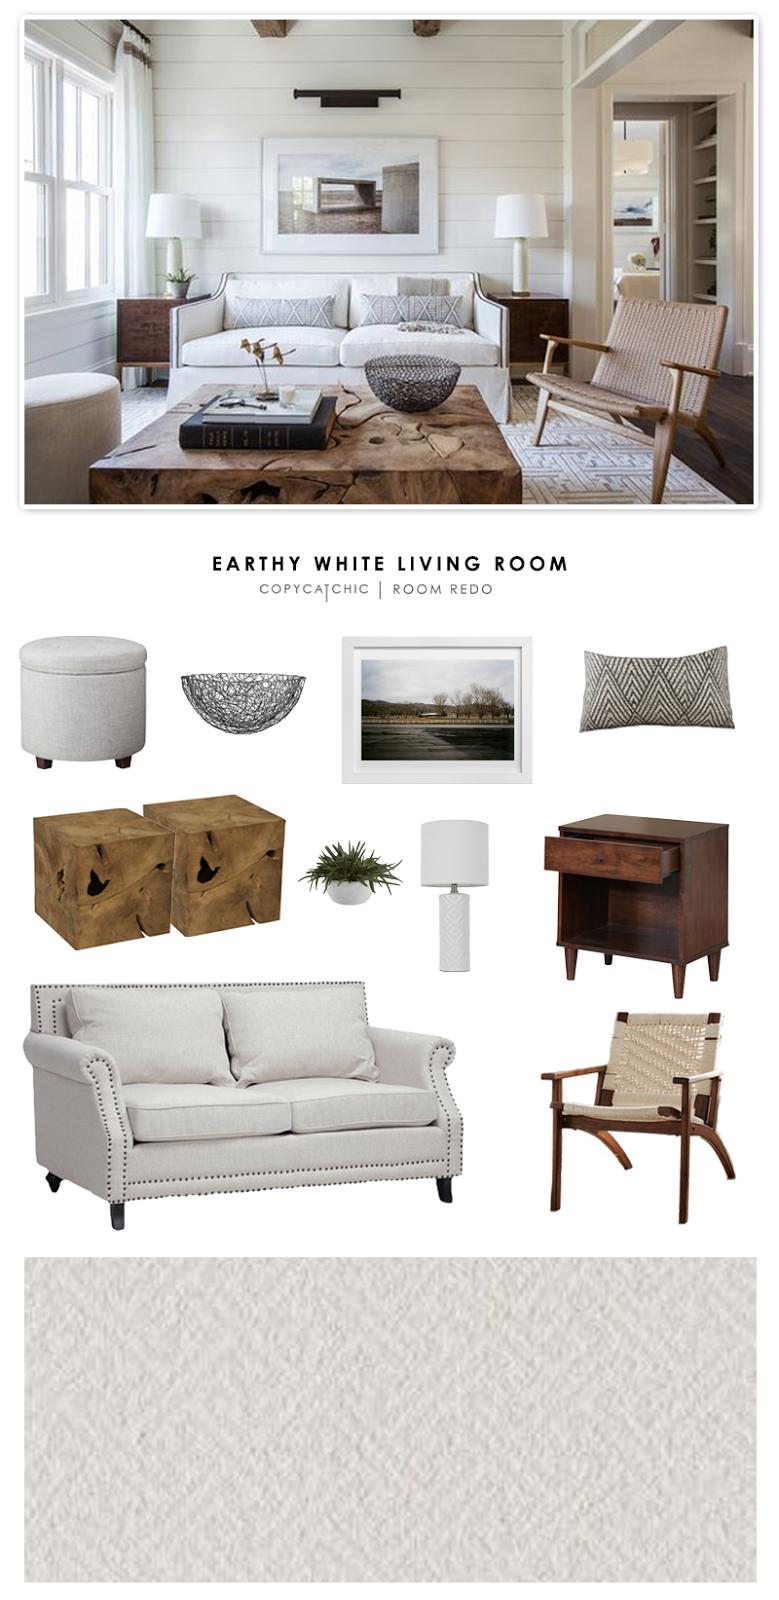 Copy cat chic room redo earthy white living room copy for Copy design